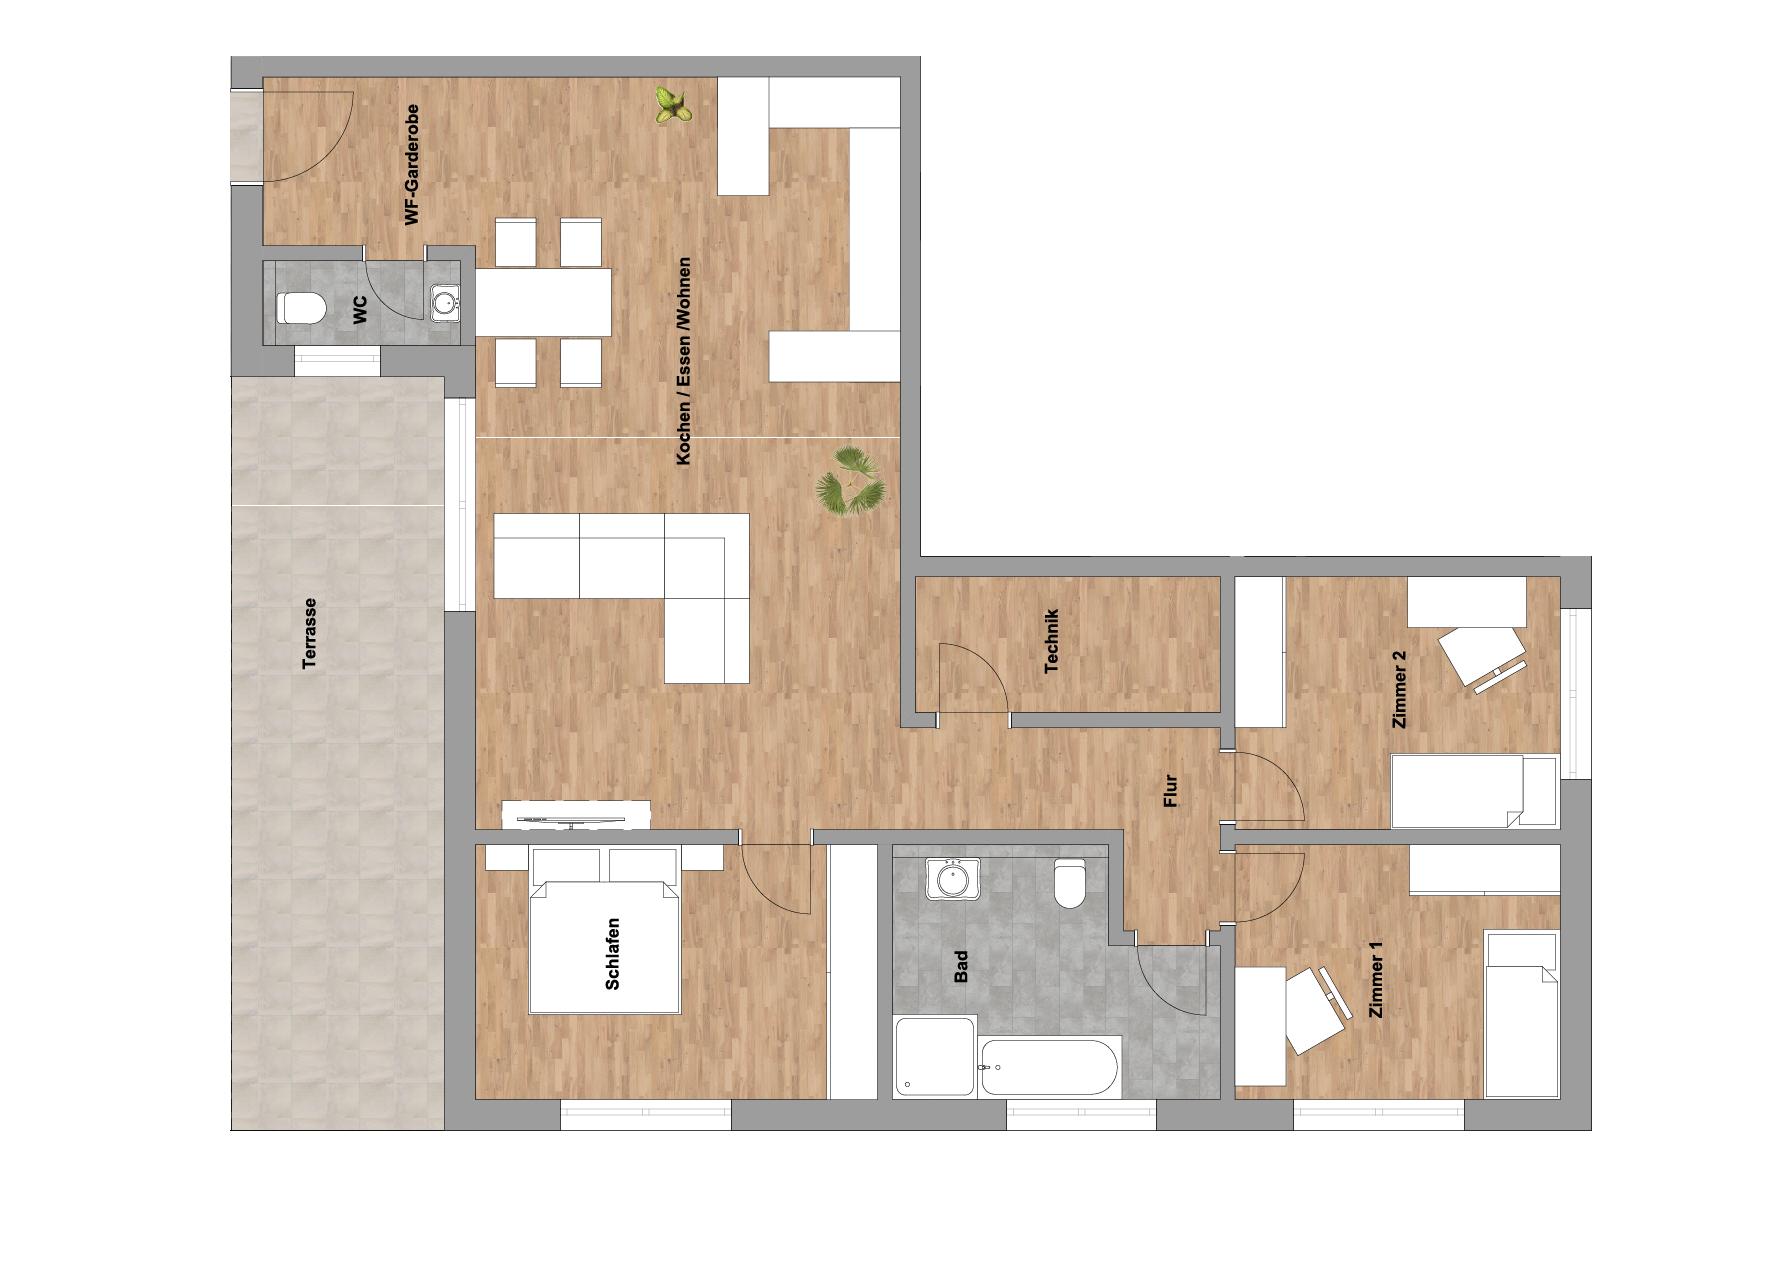 infoScout Neubau Projekt Ittersbach Wohnung 2